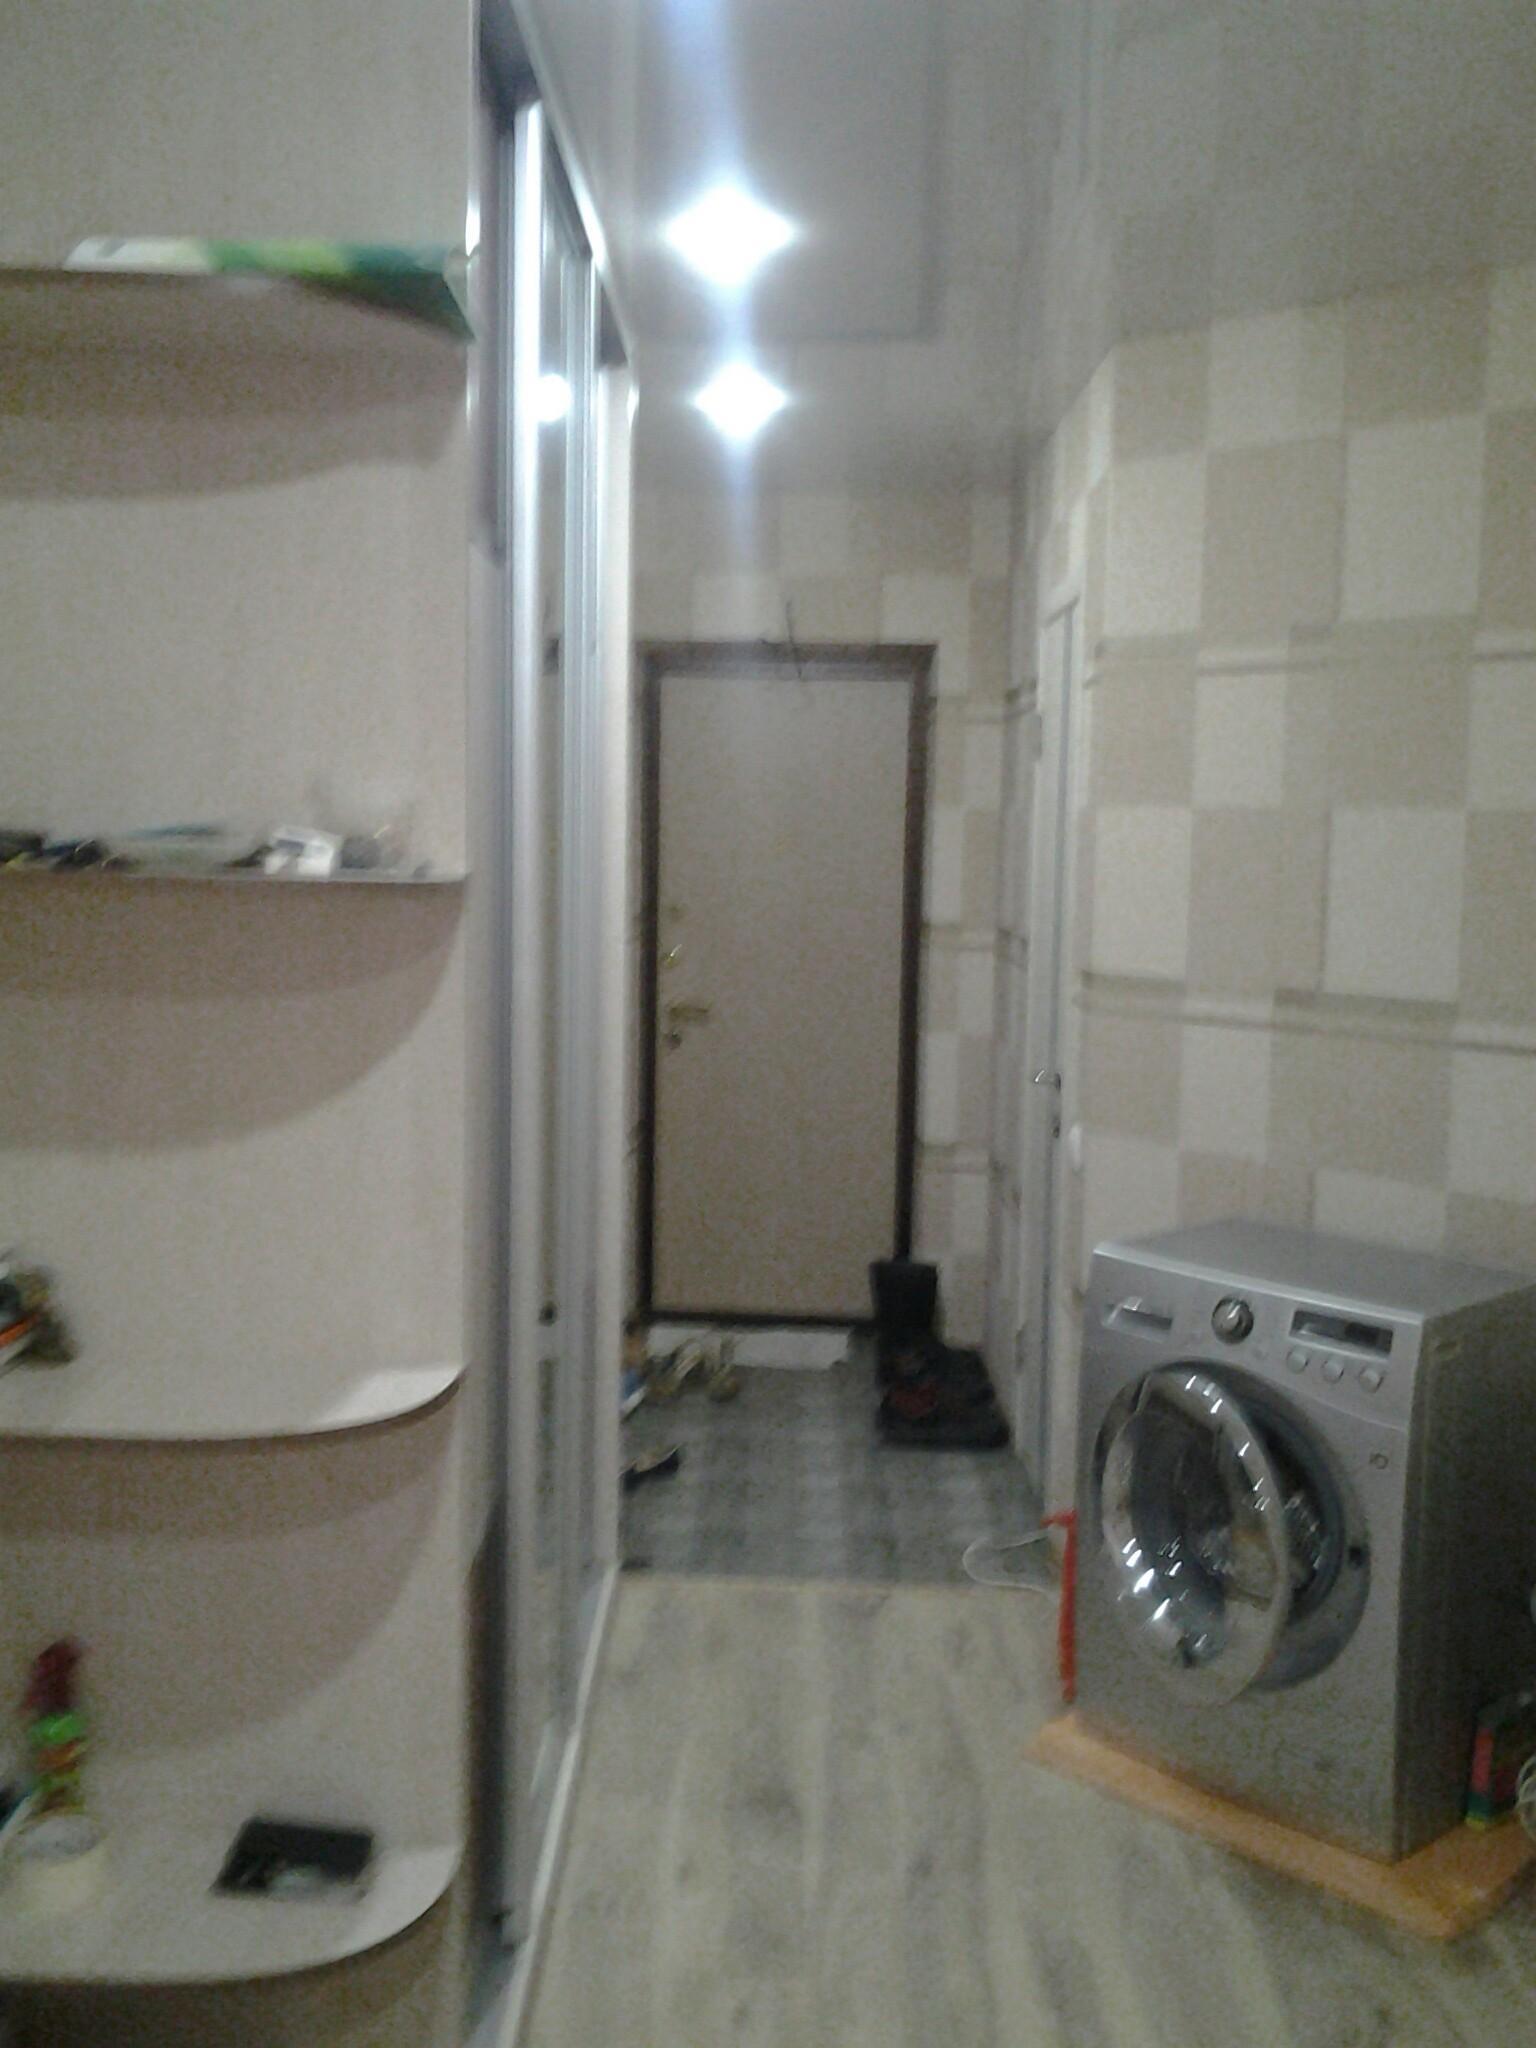 Двухкомнатная квартира - ул. Индустриальная, д. 6А